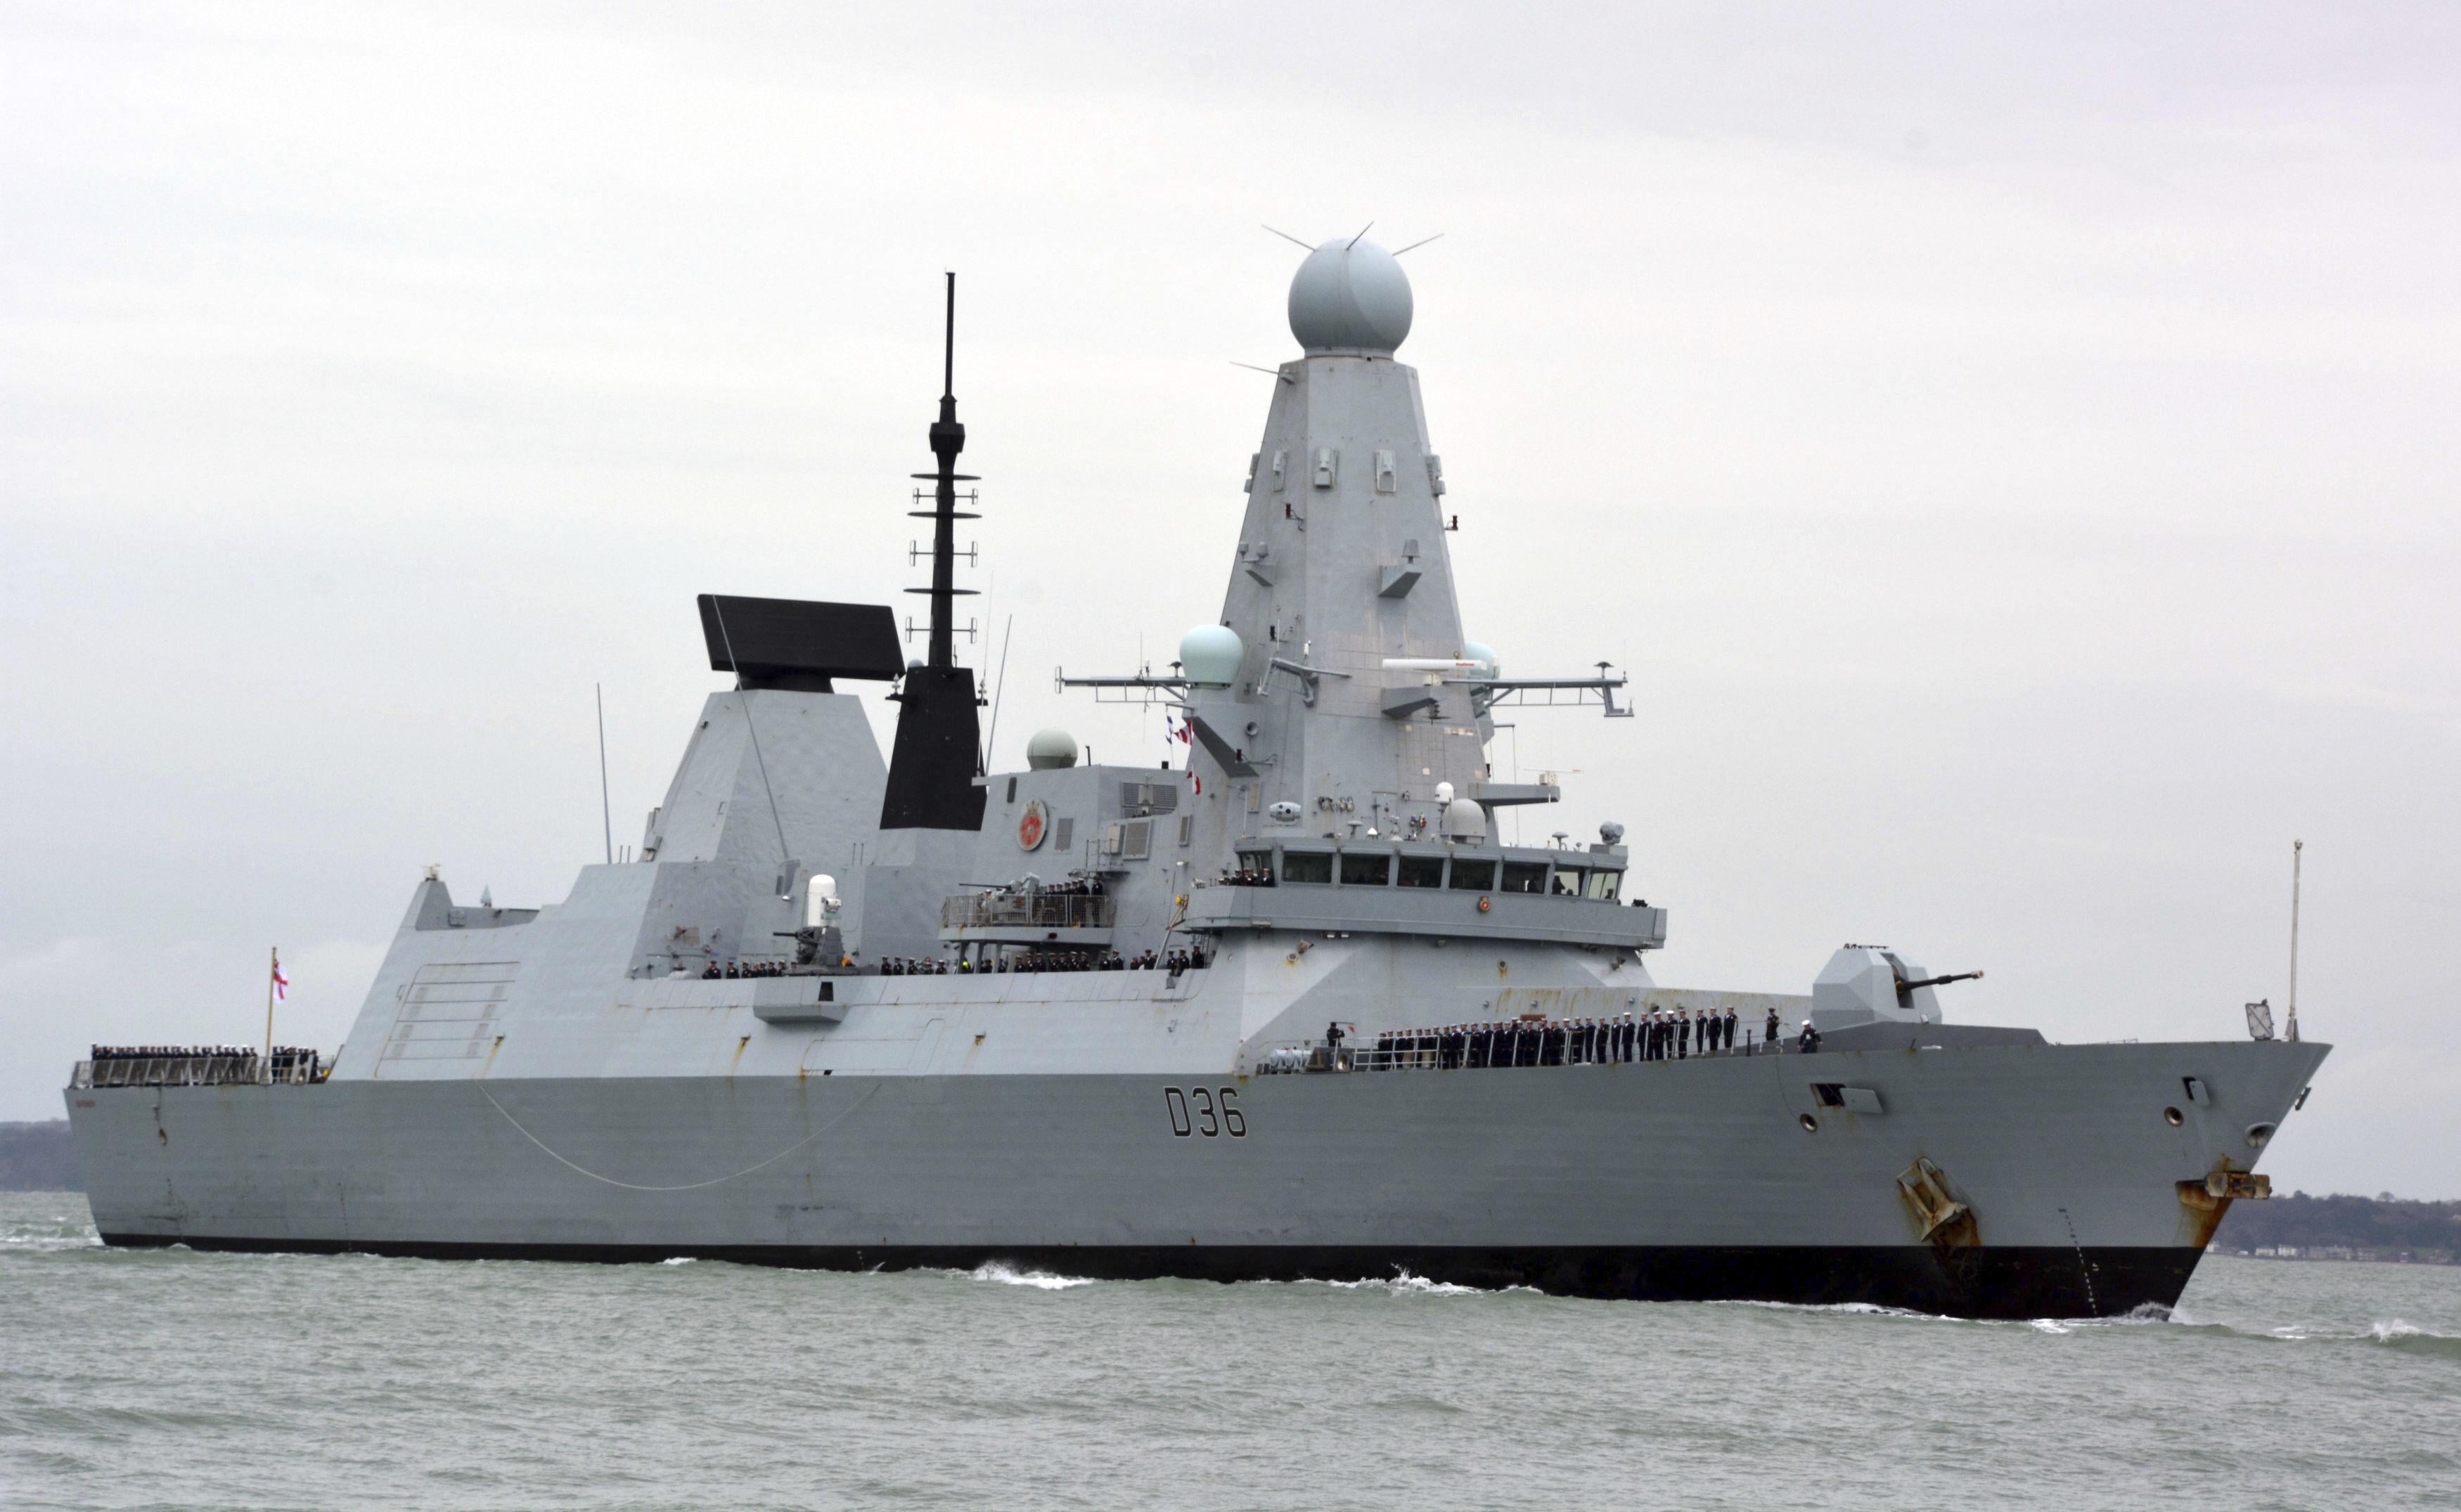 UK denies claims Russia fired warning shots, dropped bombs near British ship